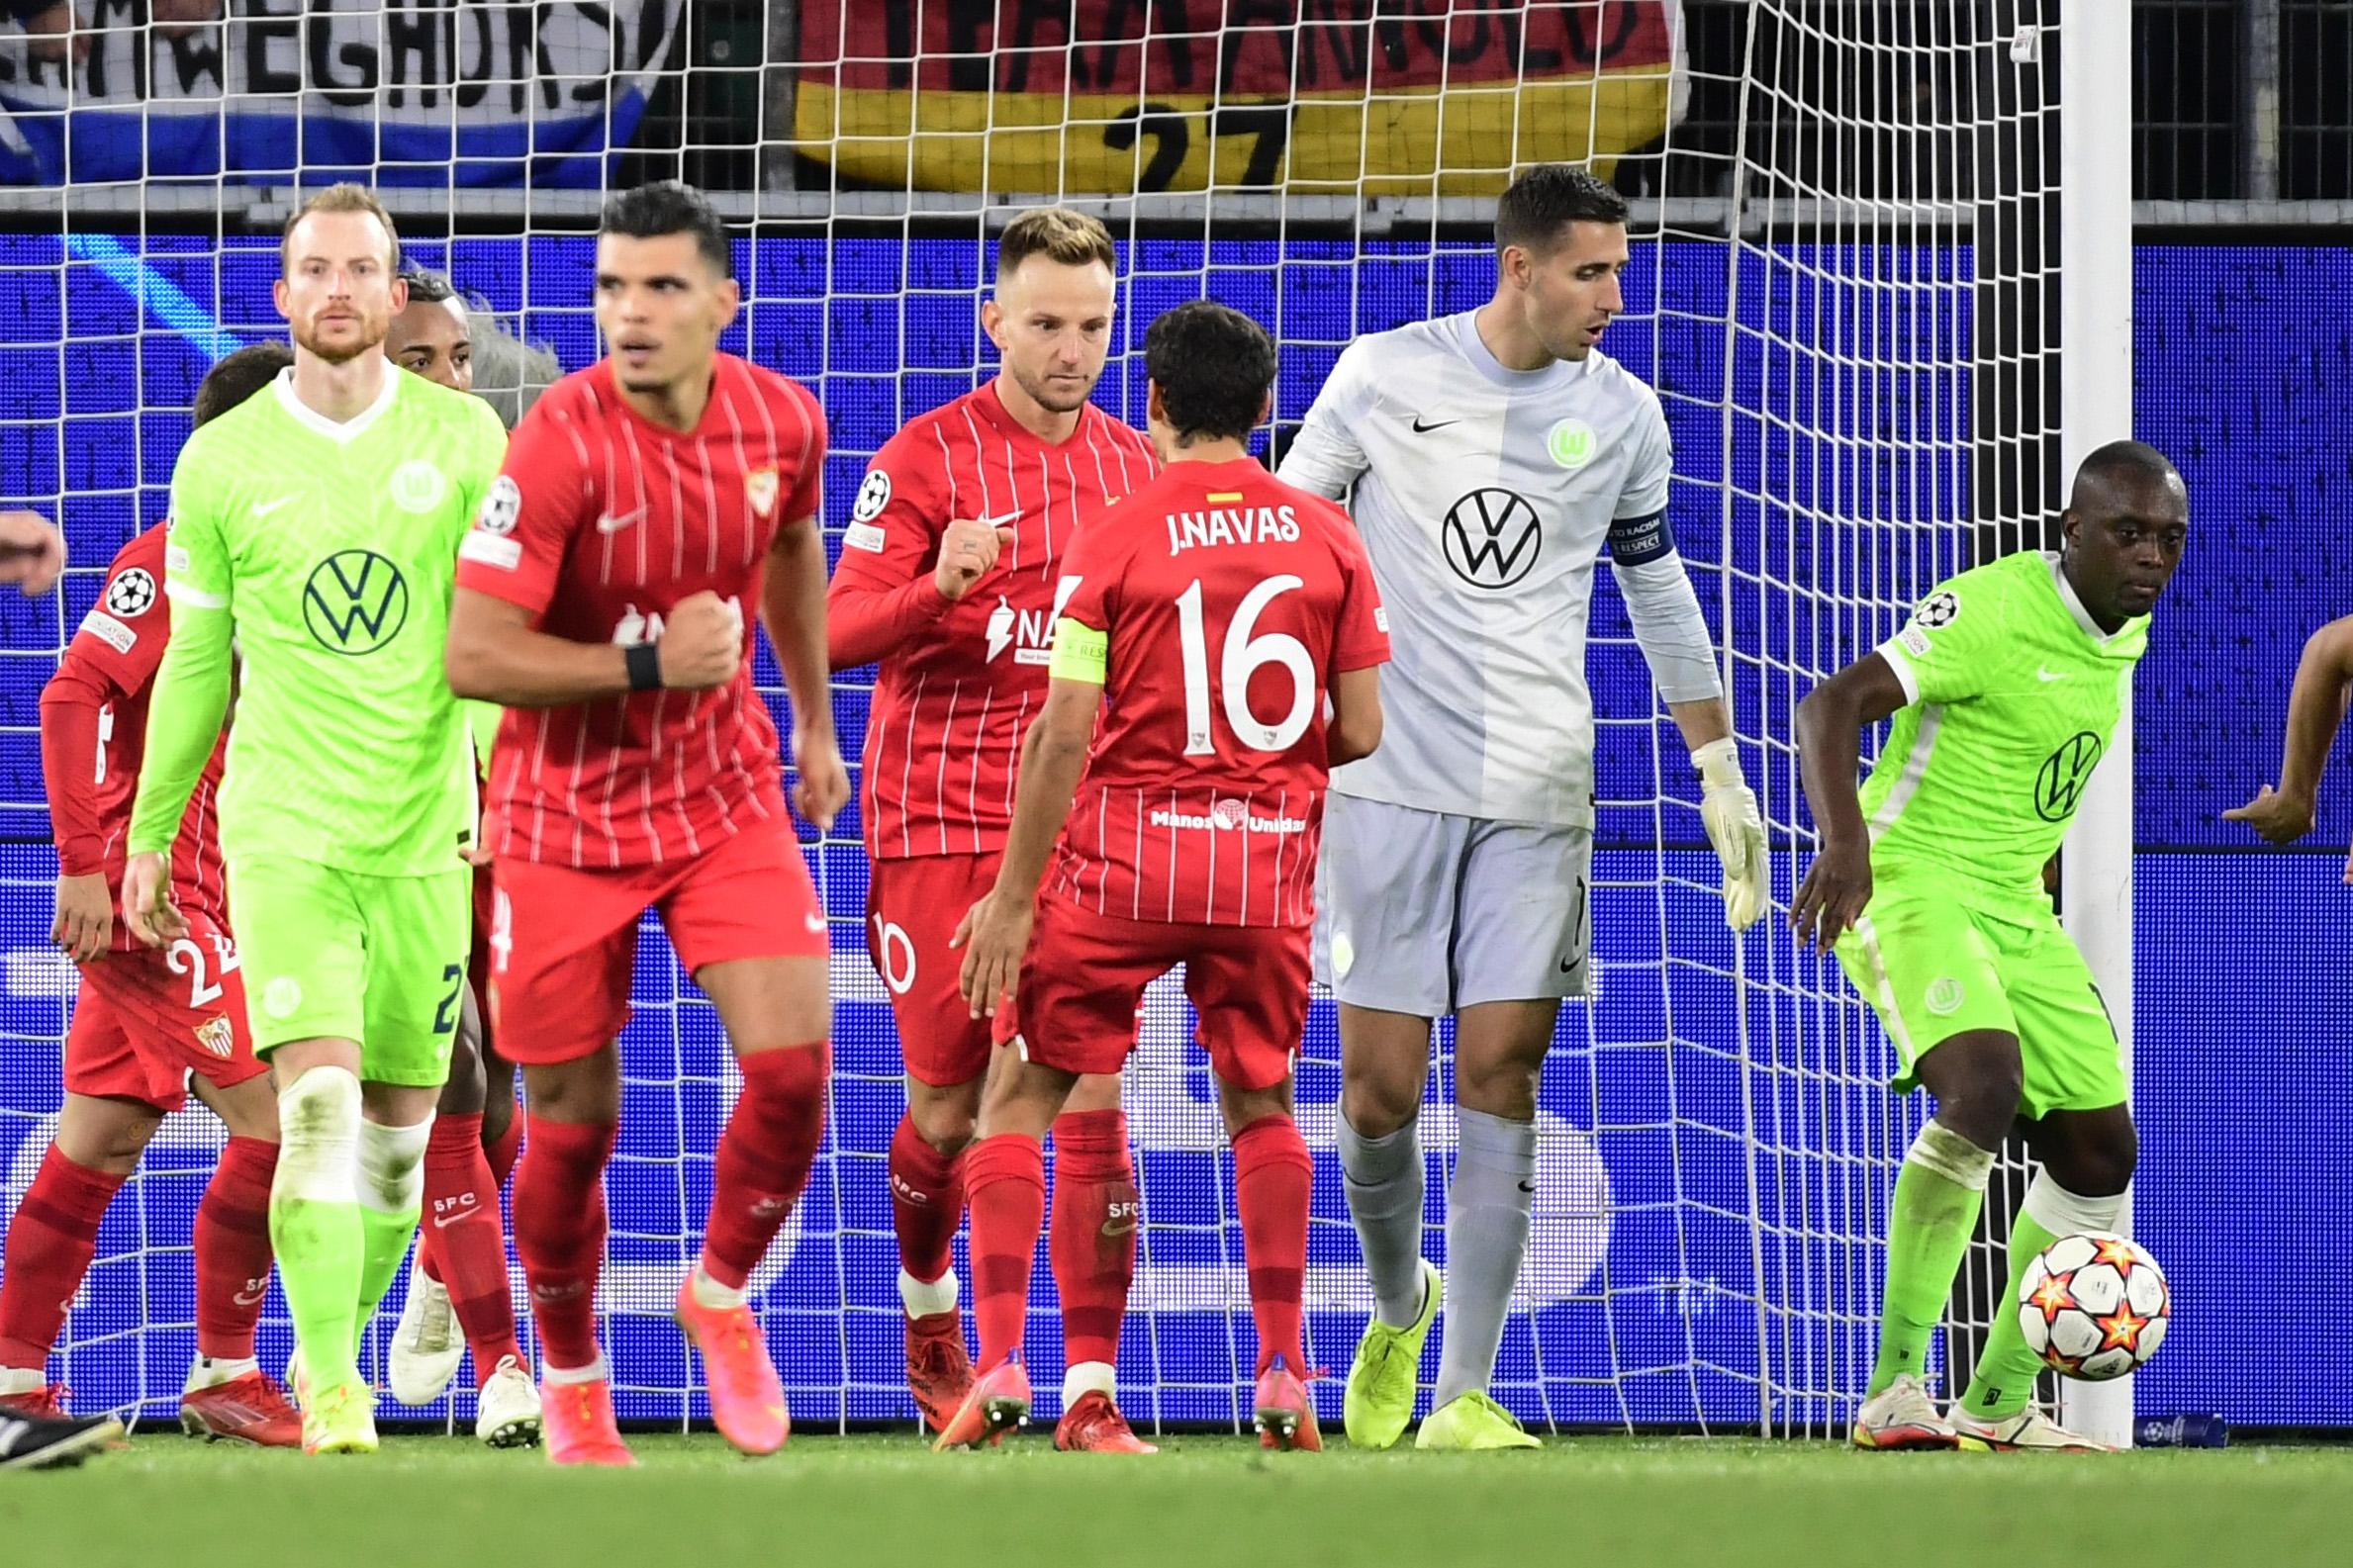 Champions League, Σάλτσμπουργκ – Λιλ 2-1 και Βόλφσμπουργκ – Σεβίλλη 1-1